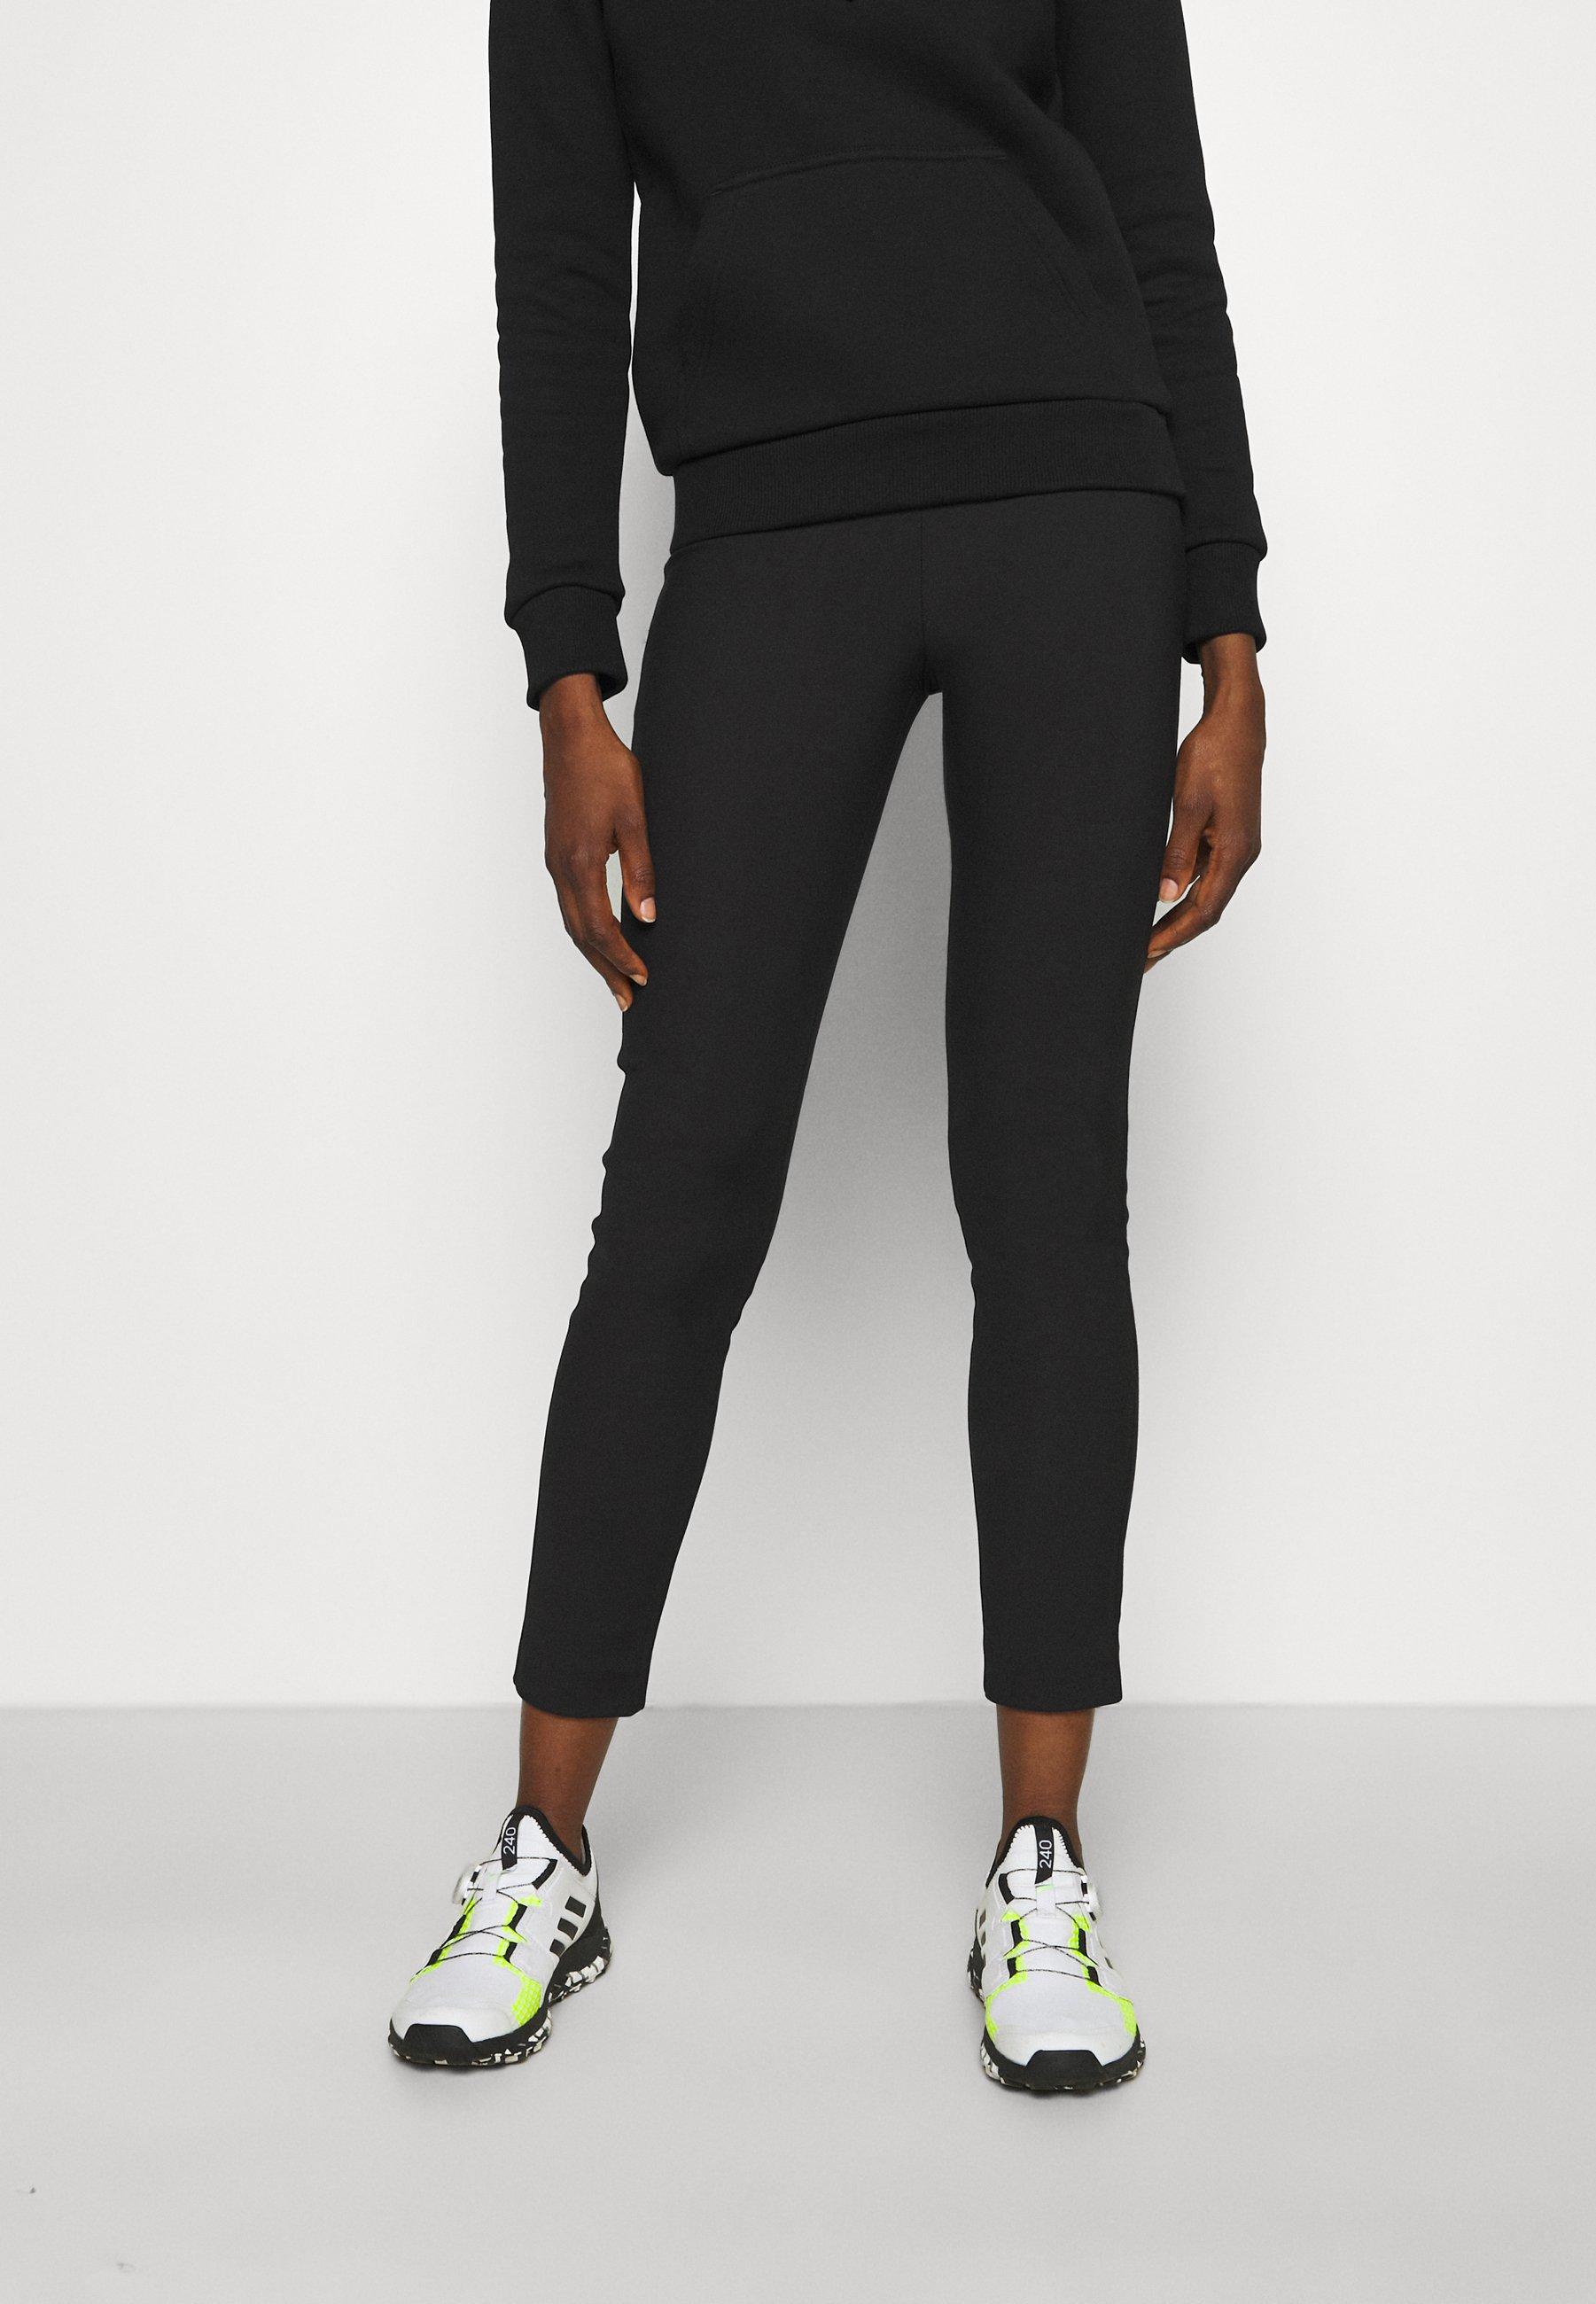 Damen GRACE NARROW PANTS - Jogginghose